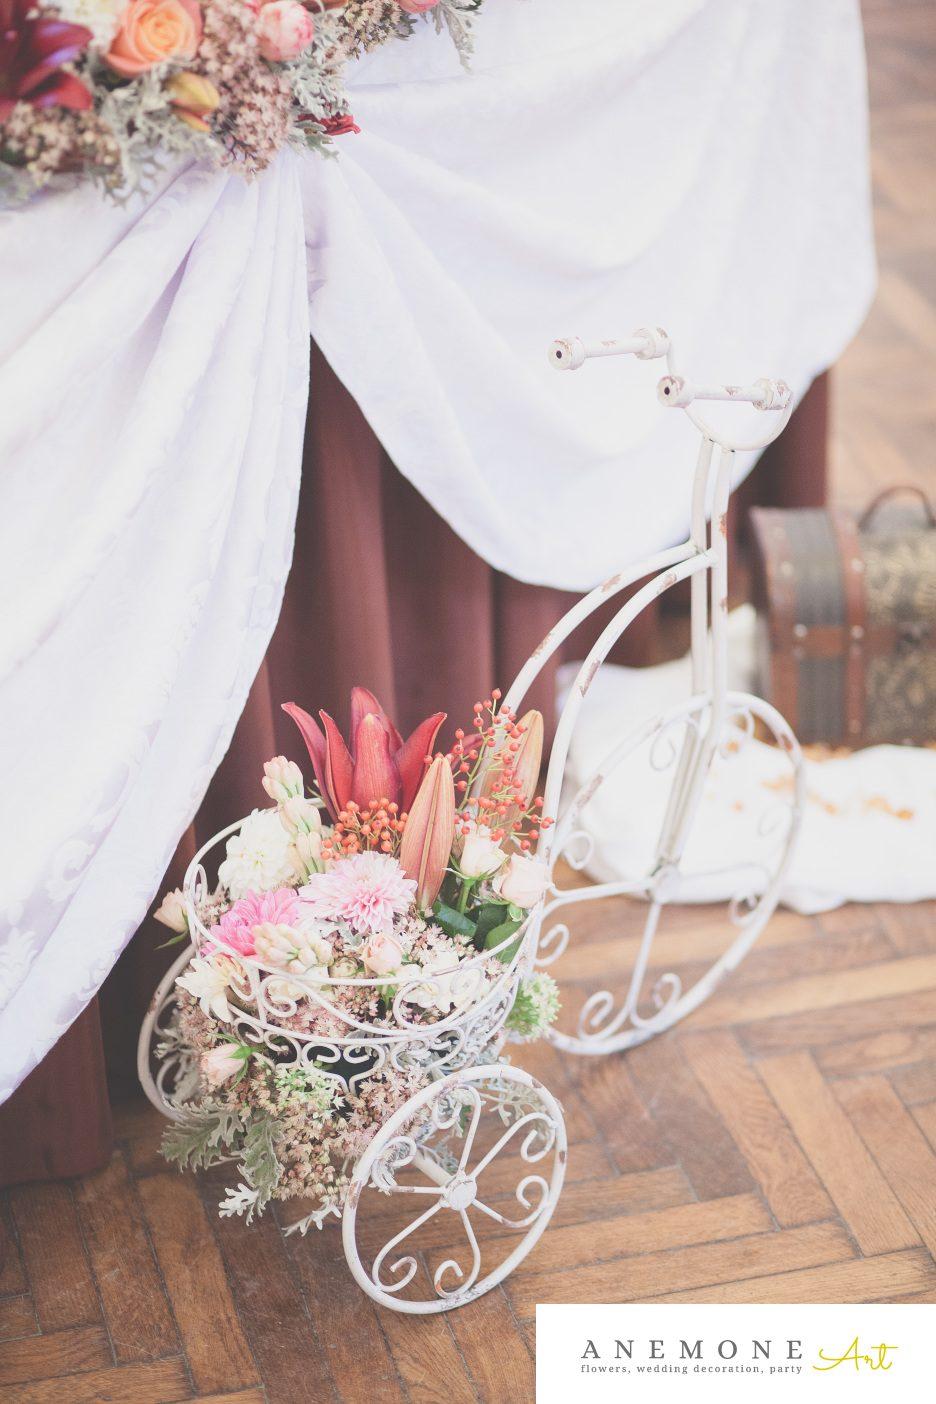 Poza, foto cu Flori de nunta bicicleta, bordo, prezidiu in Arad, Timisoara, Oradea (wedding flowers, bouquets) nunta Arad, Timisoara, Oradea